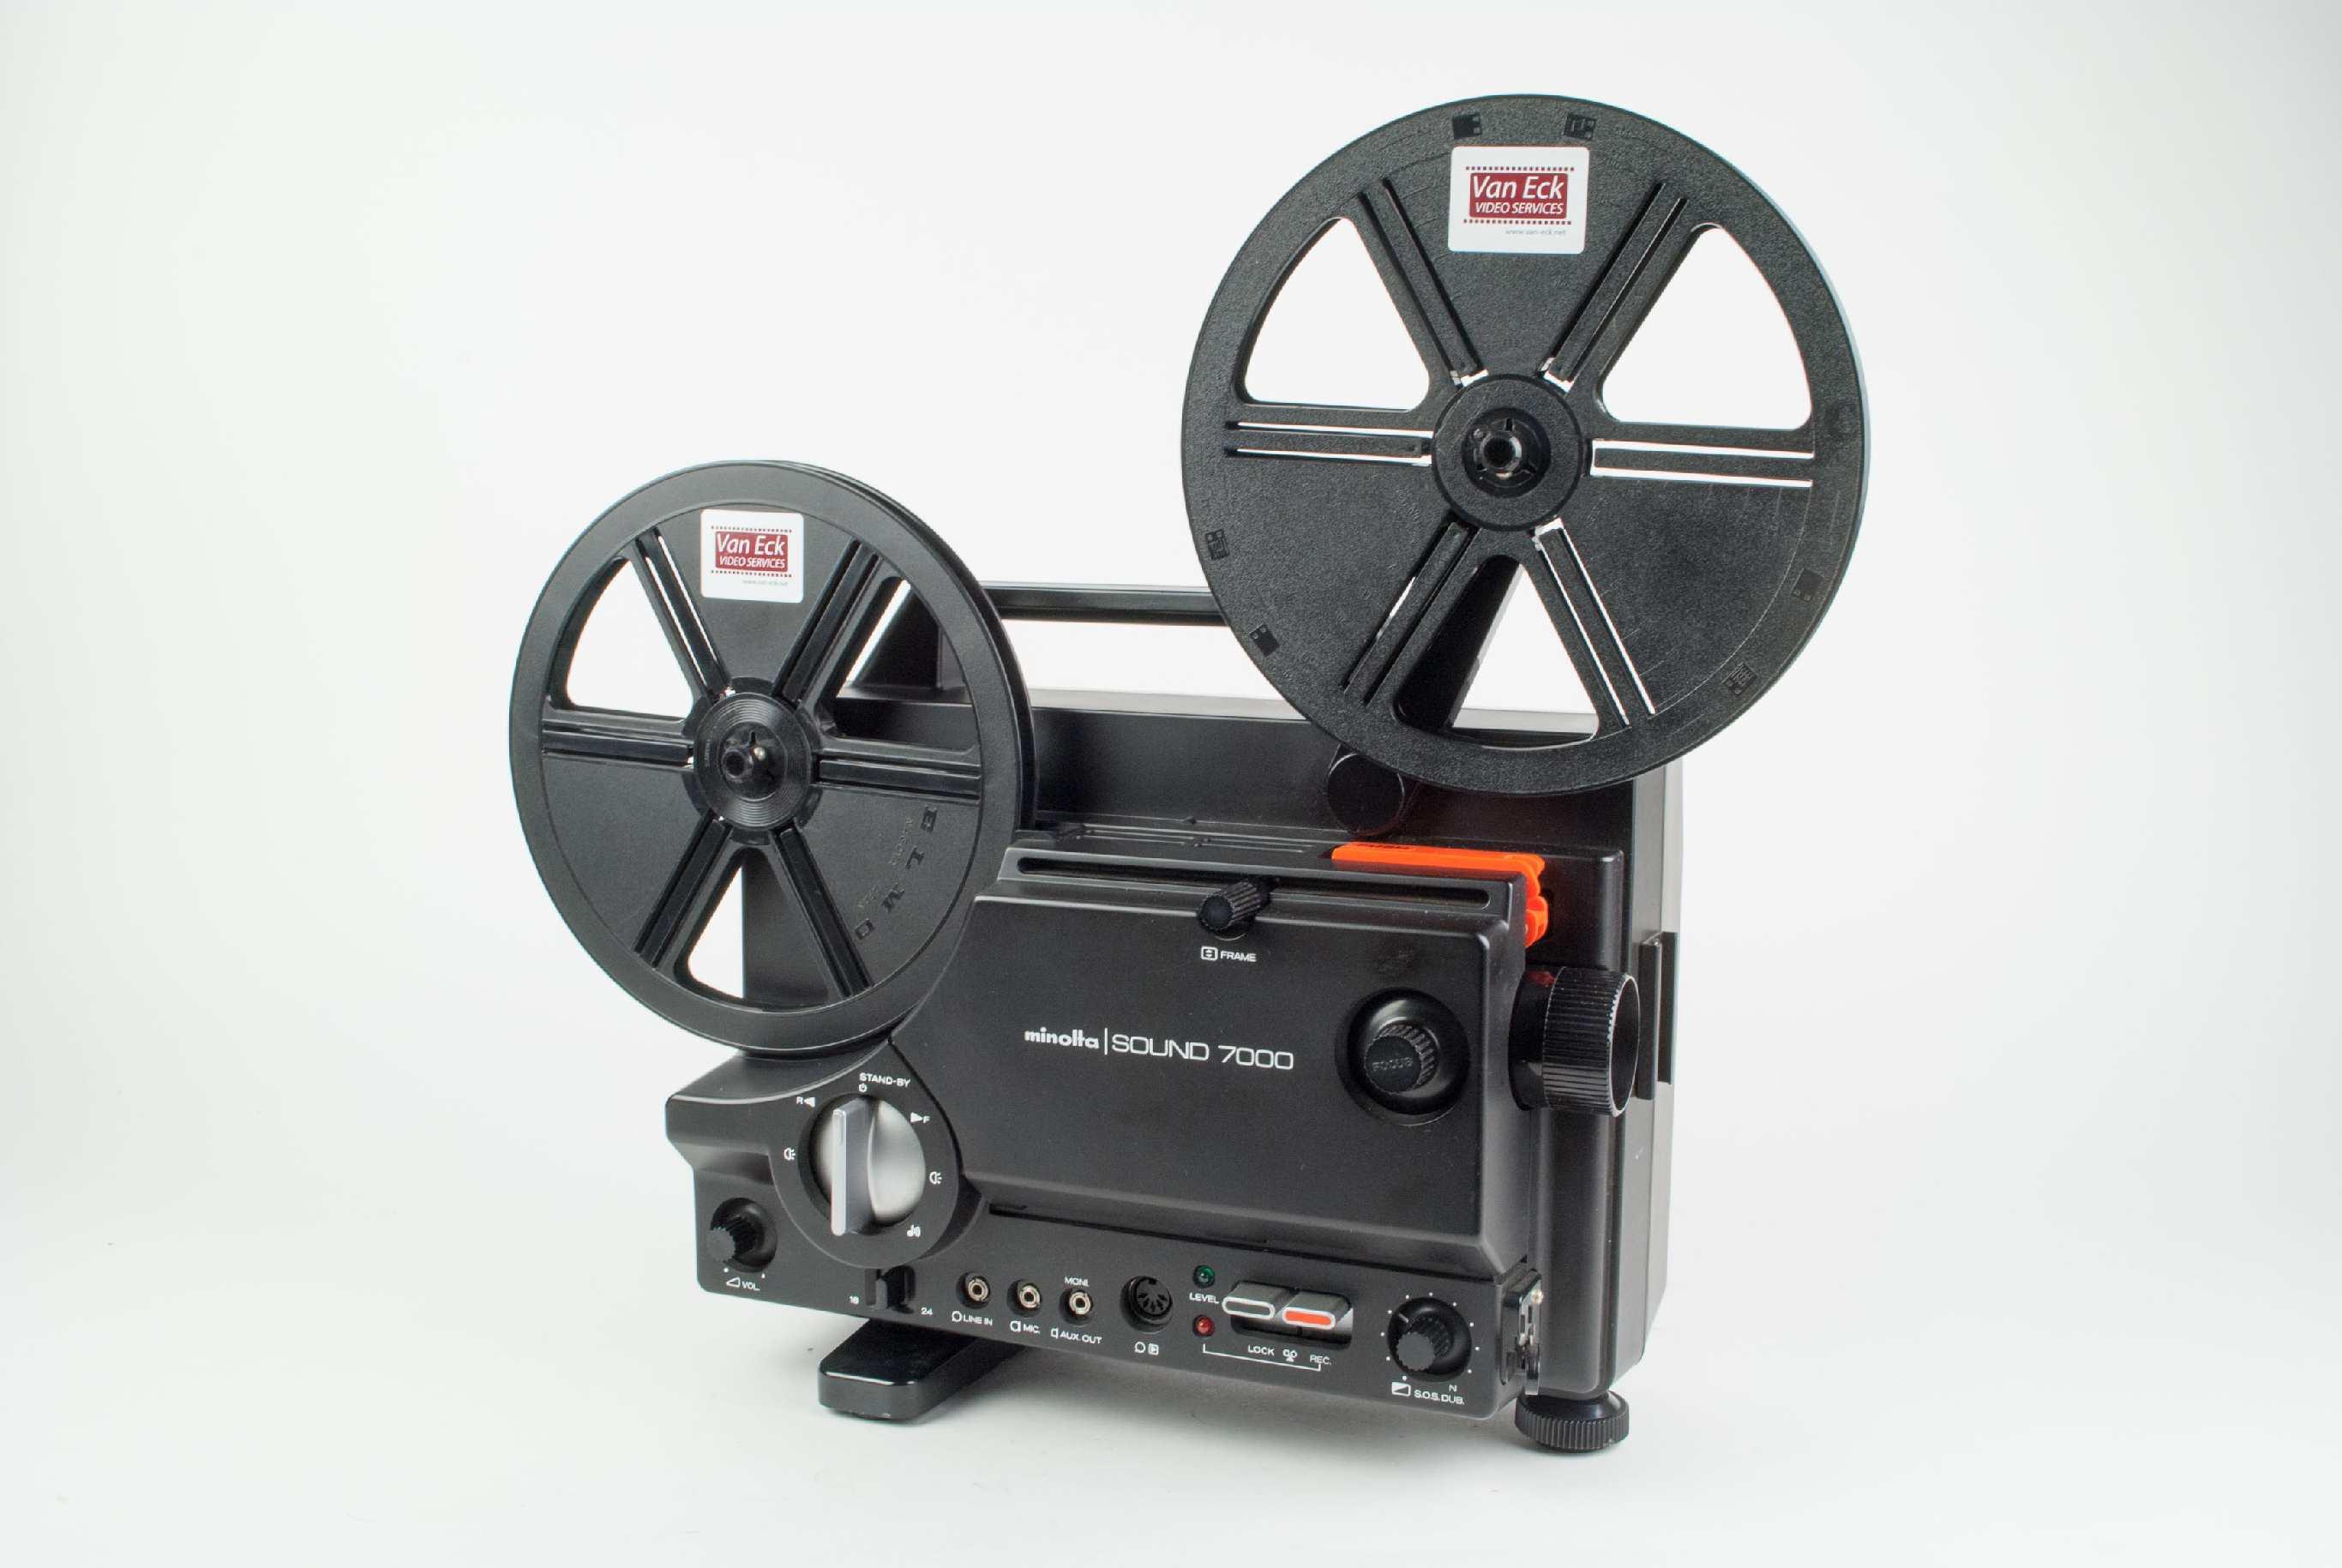 Minolta Sound 7000, Film Projectors - Spare Parts and Information